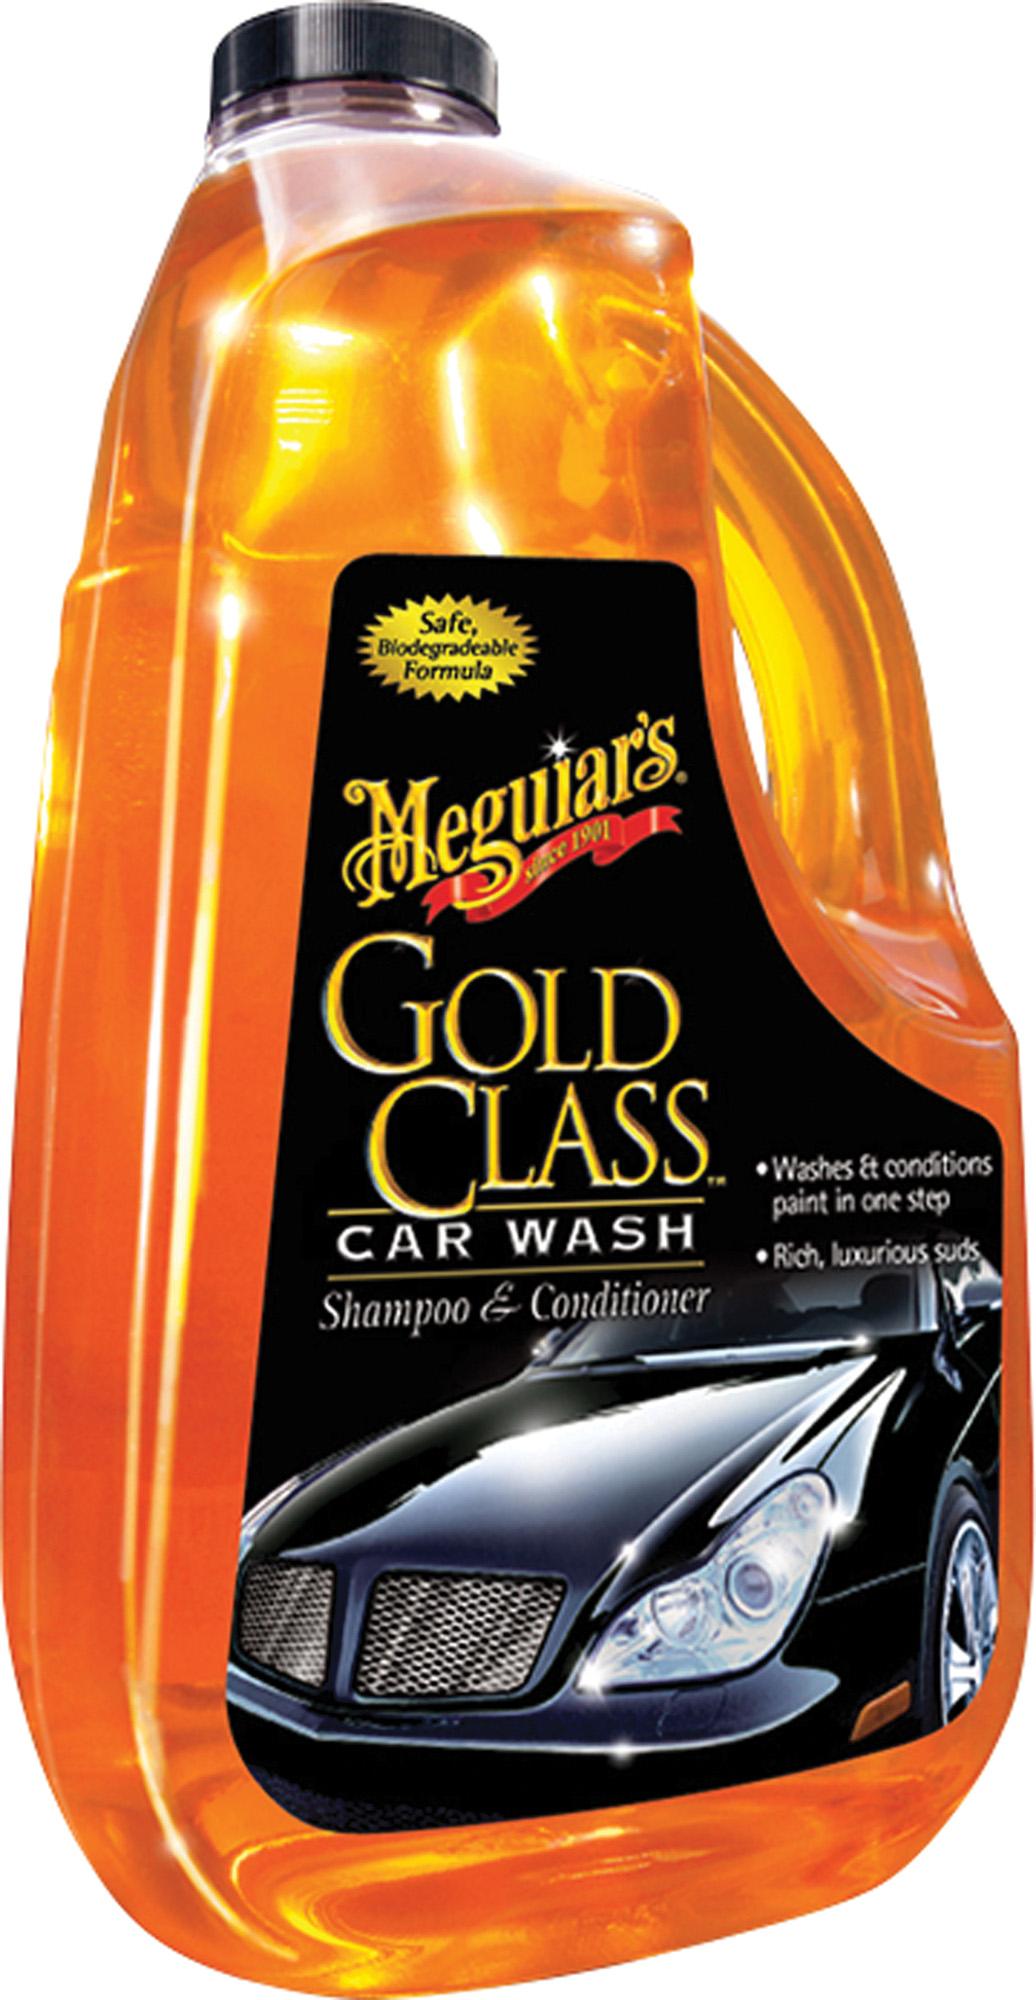 Gold Glass Shampoo